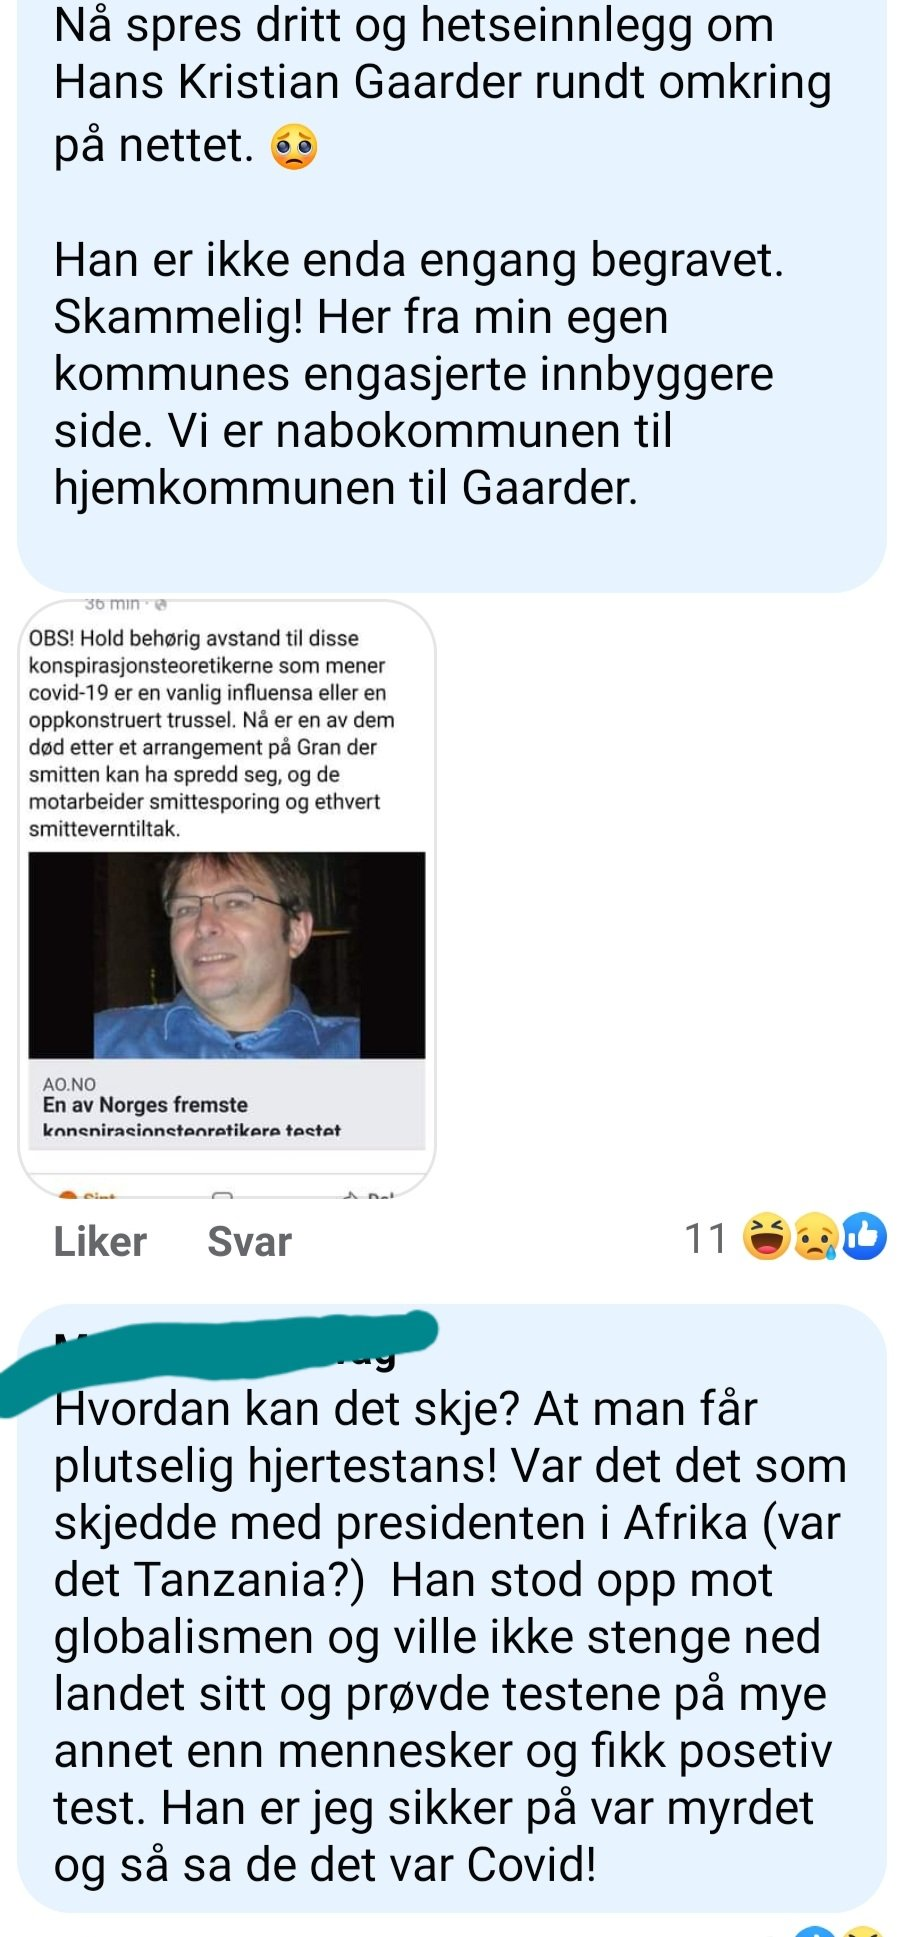 Hans Kristian Gaarder